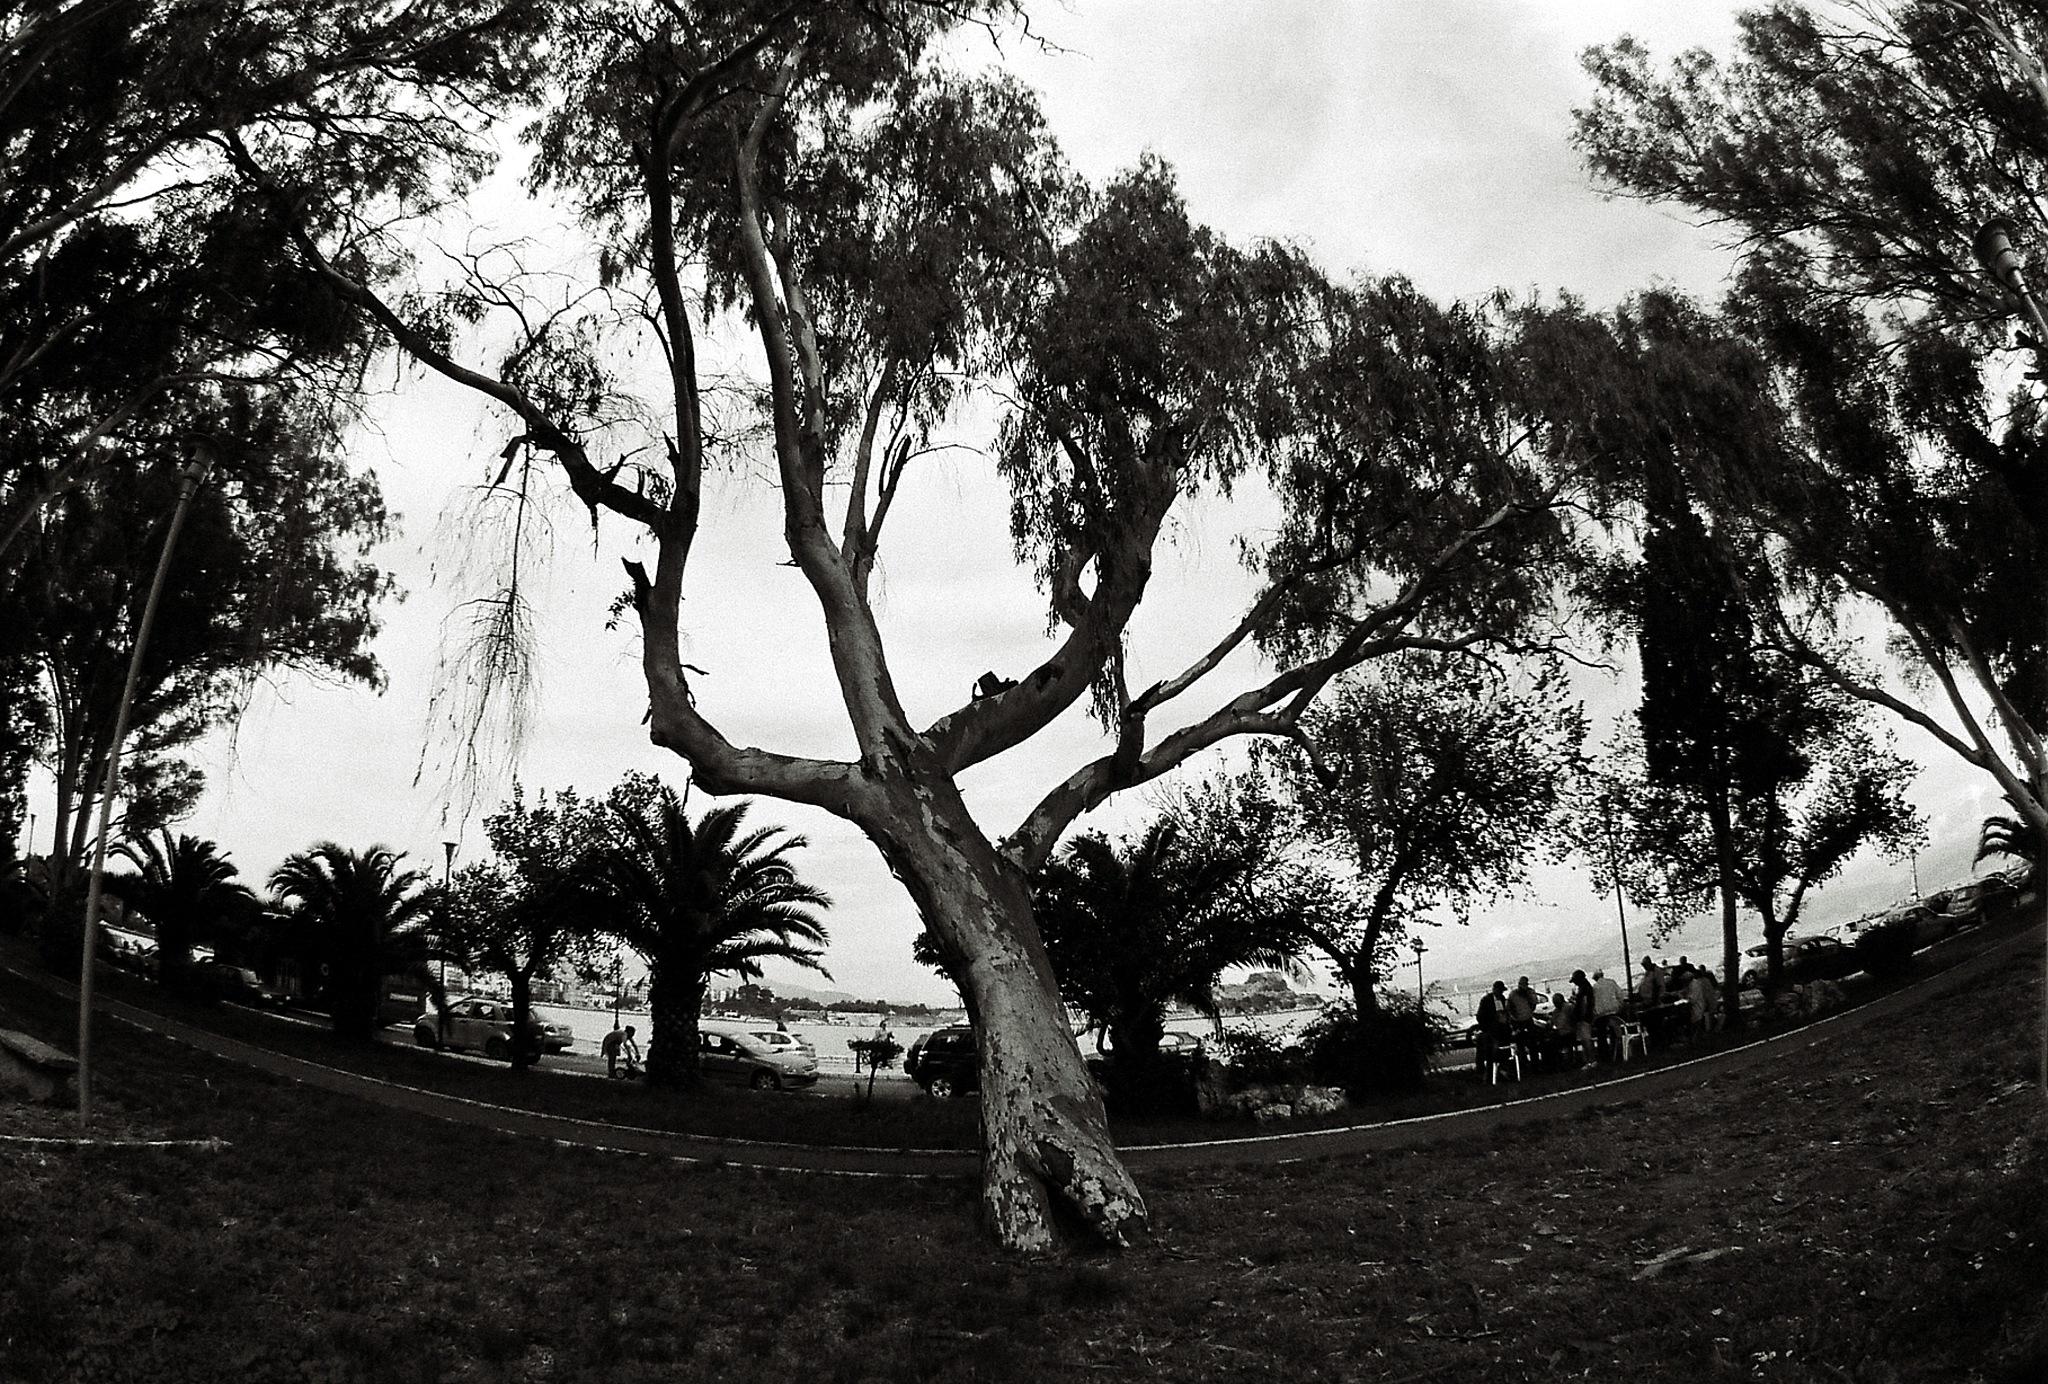 The Desperate Tree by  Sotiris Hartzavalos